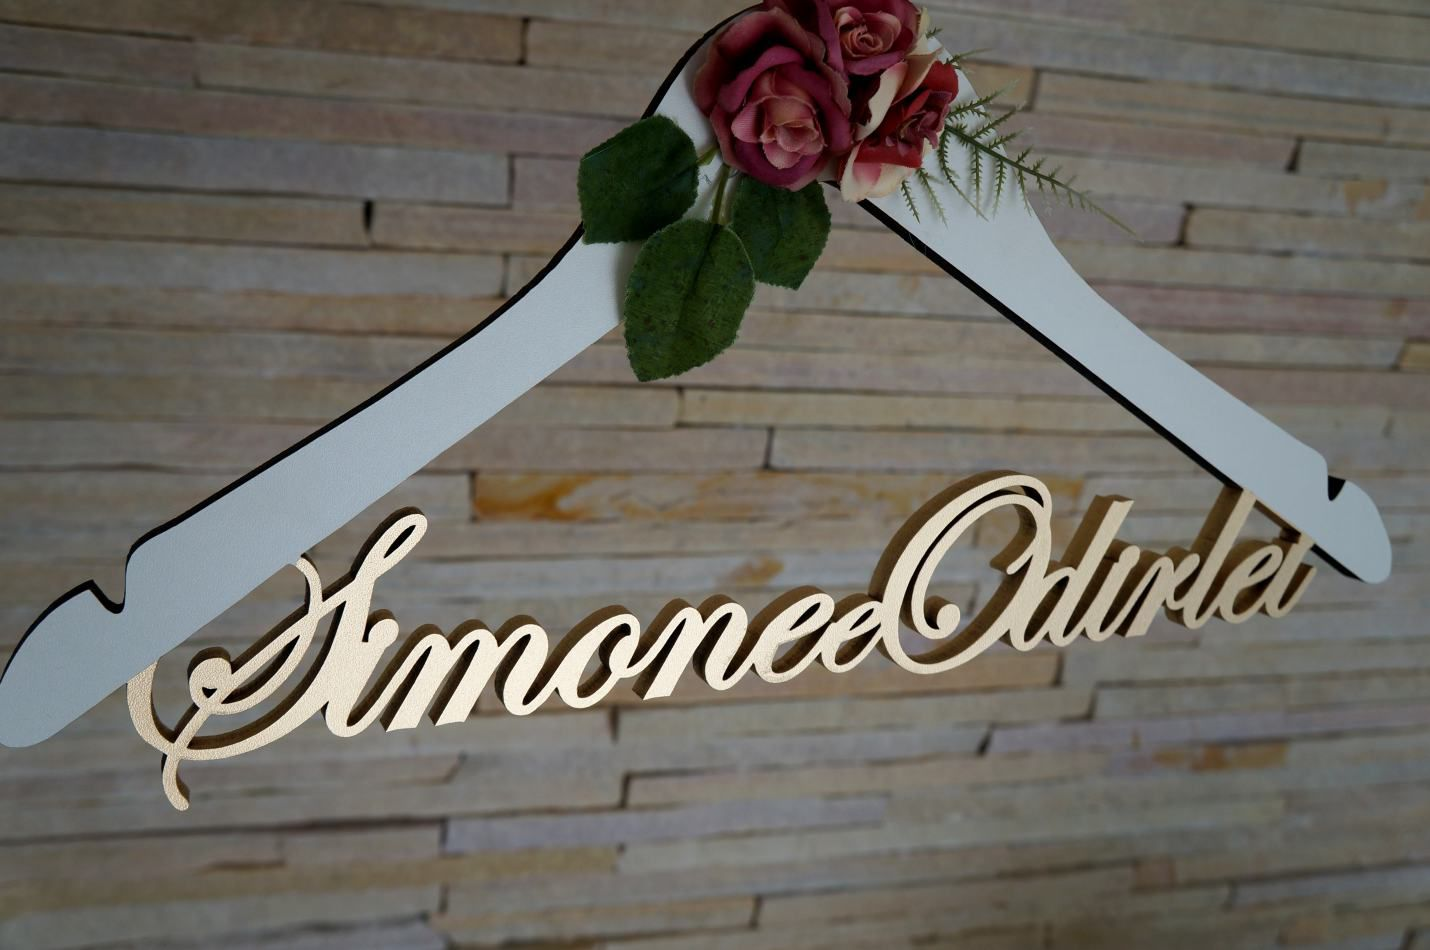 Cabide Simone e Odirlei